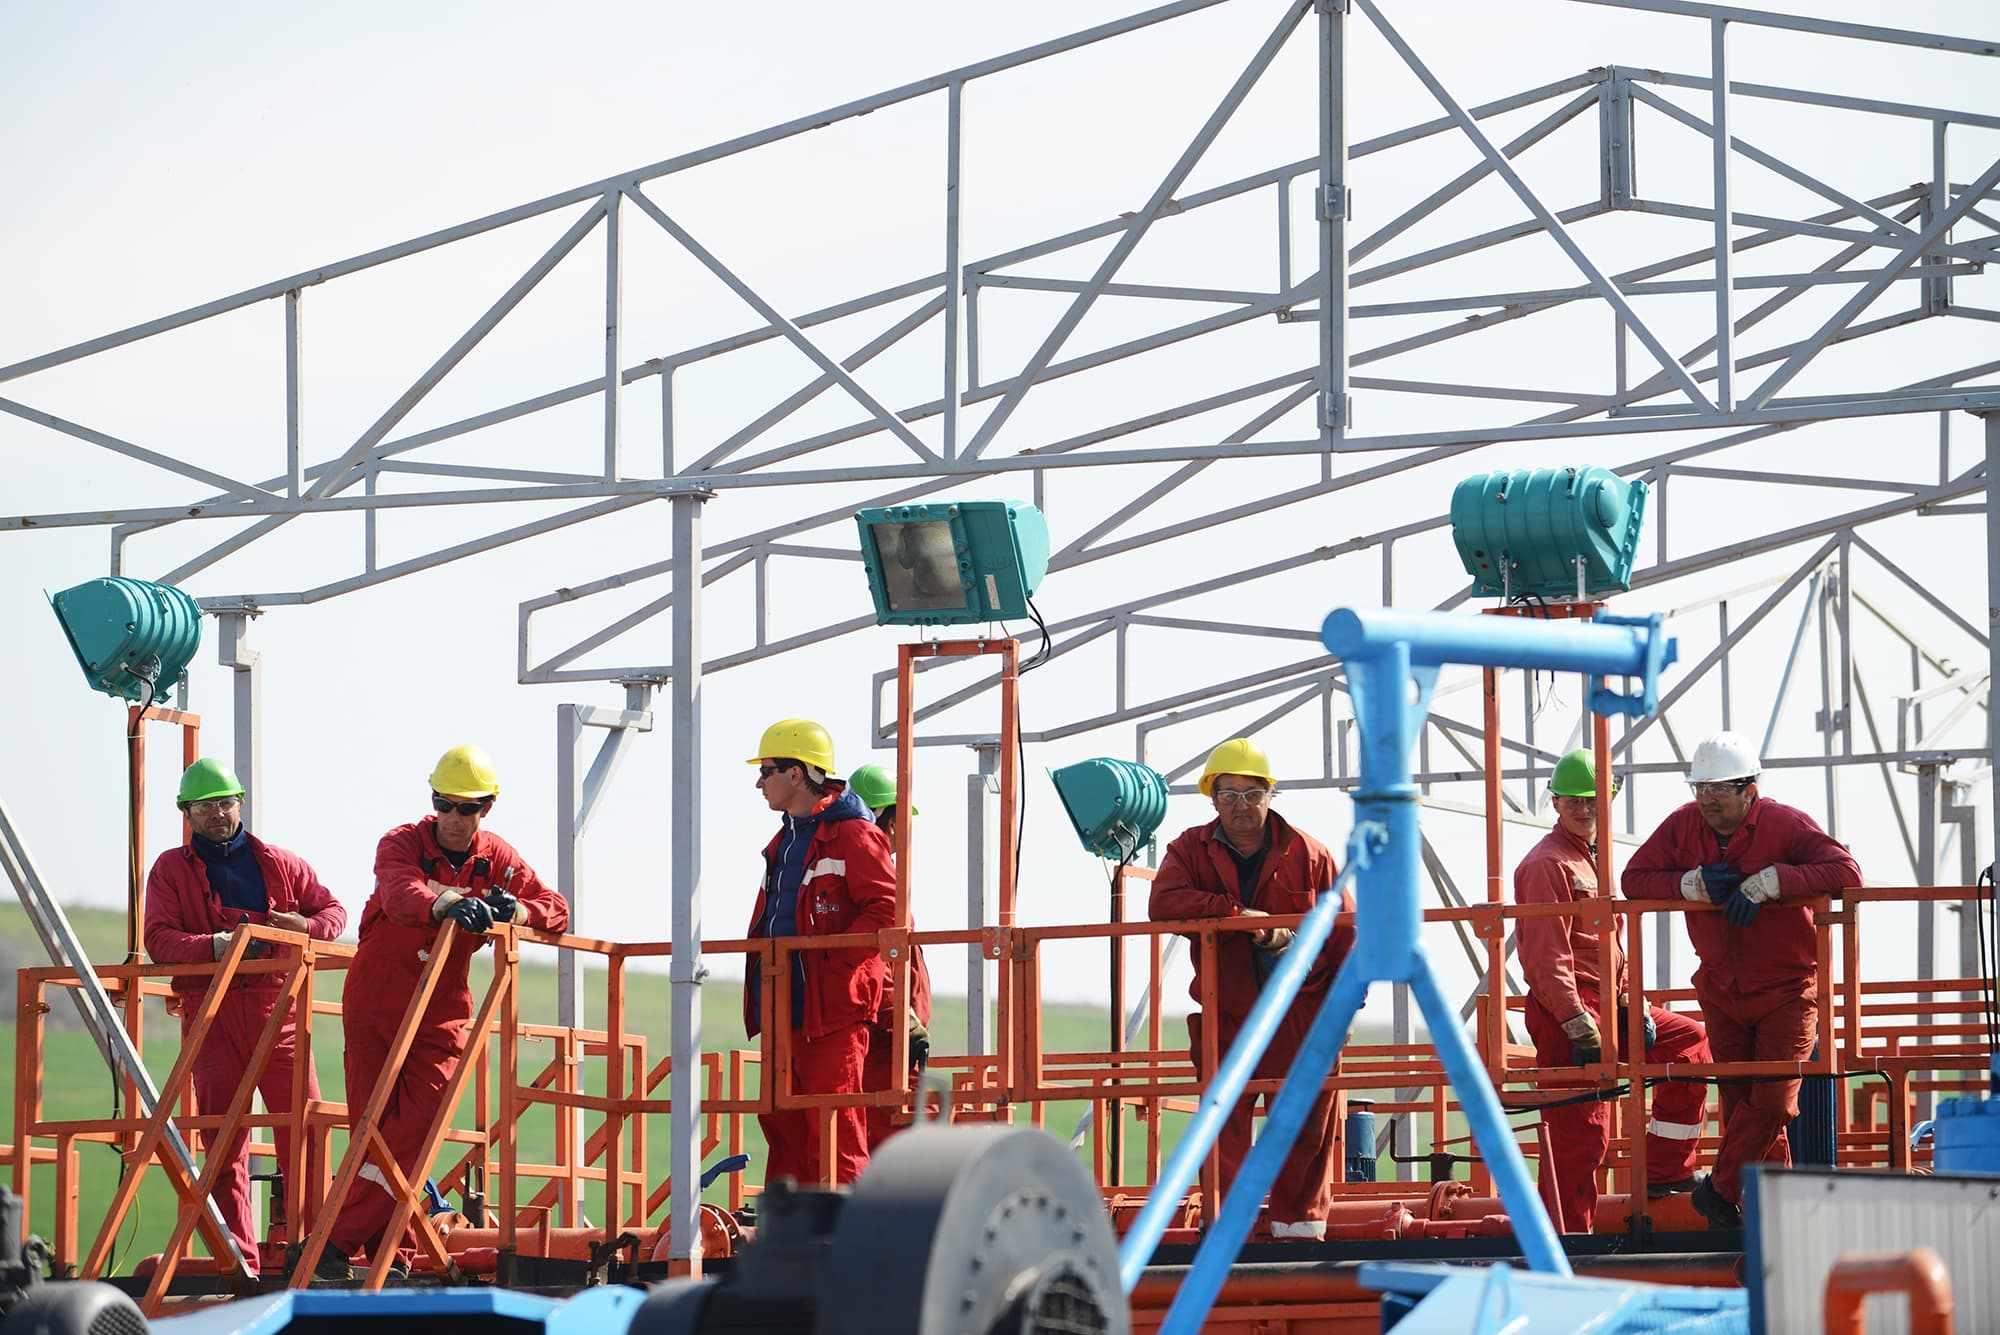 chevron oil results profit recovery